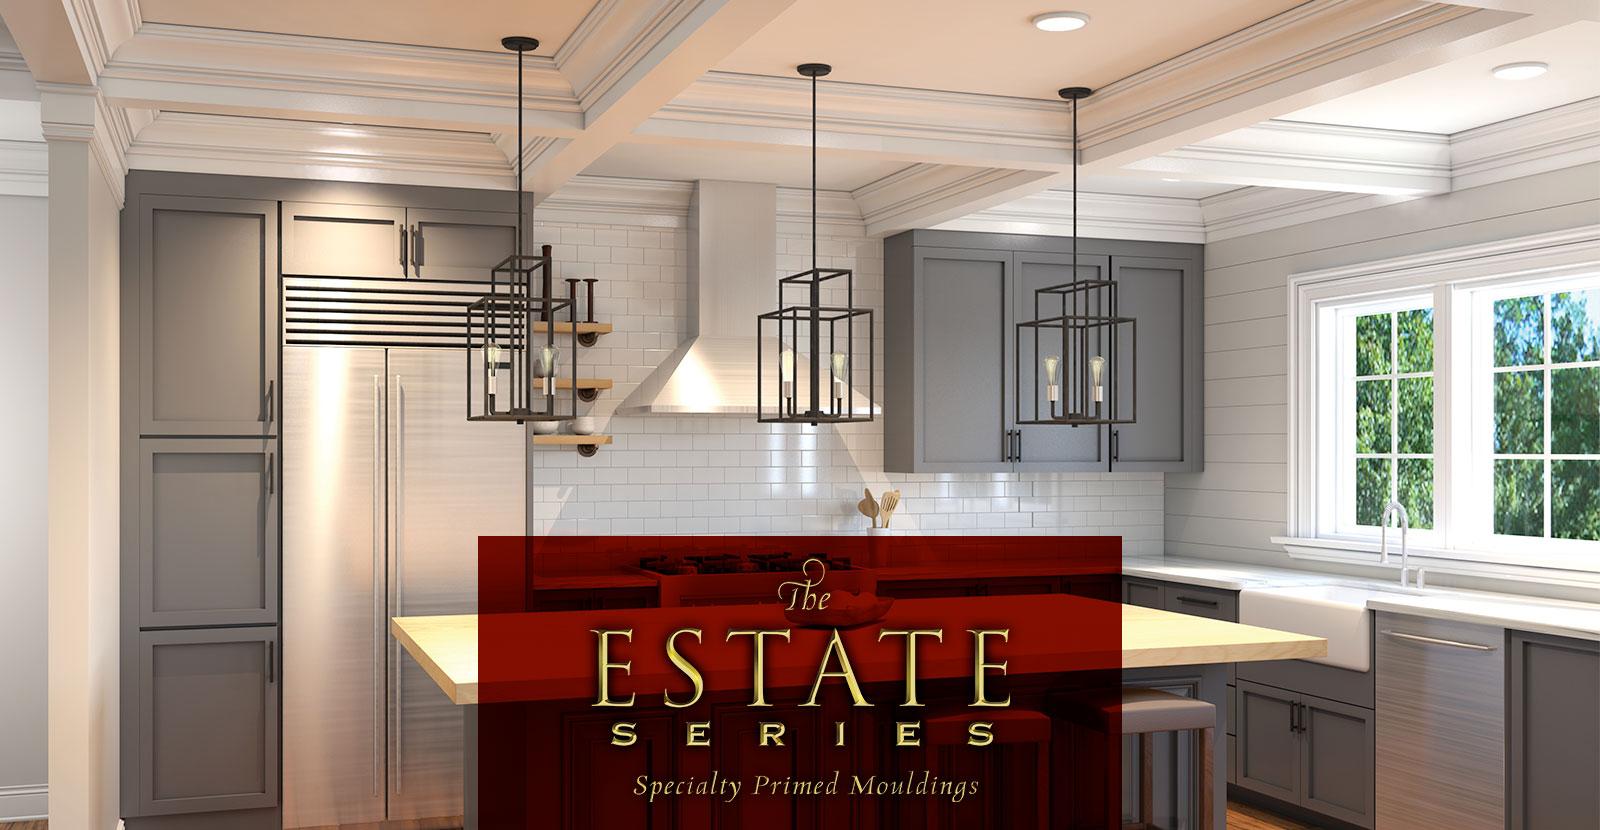 The Estate Series